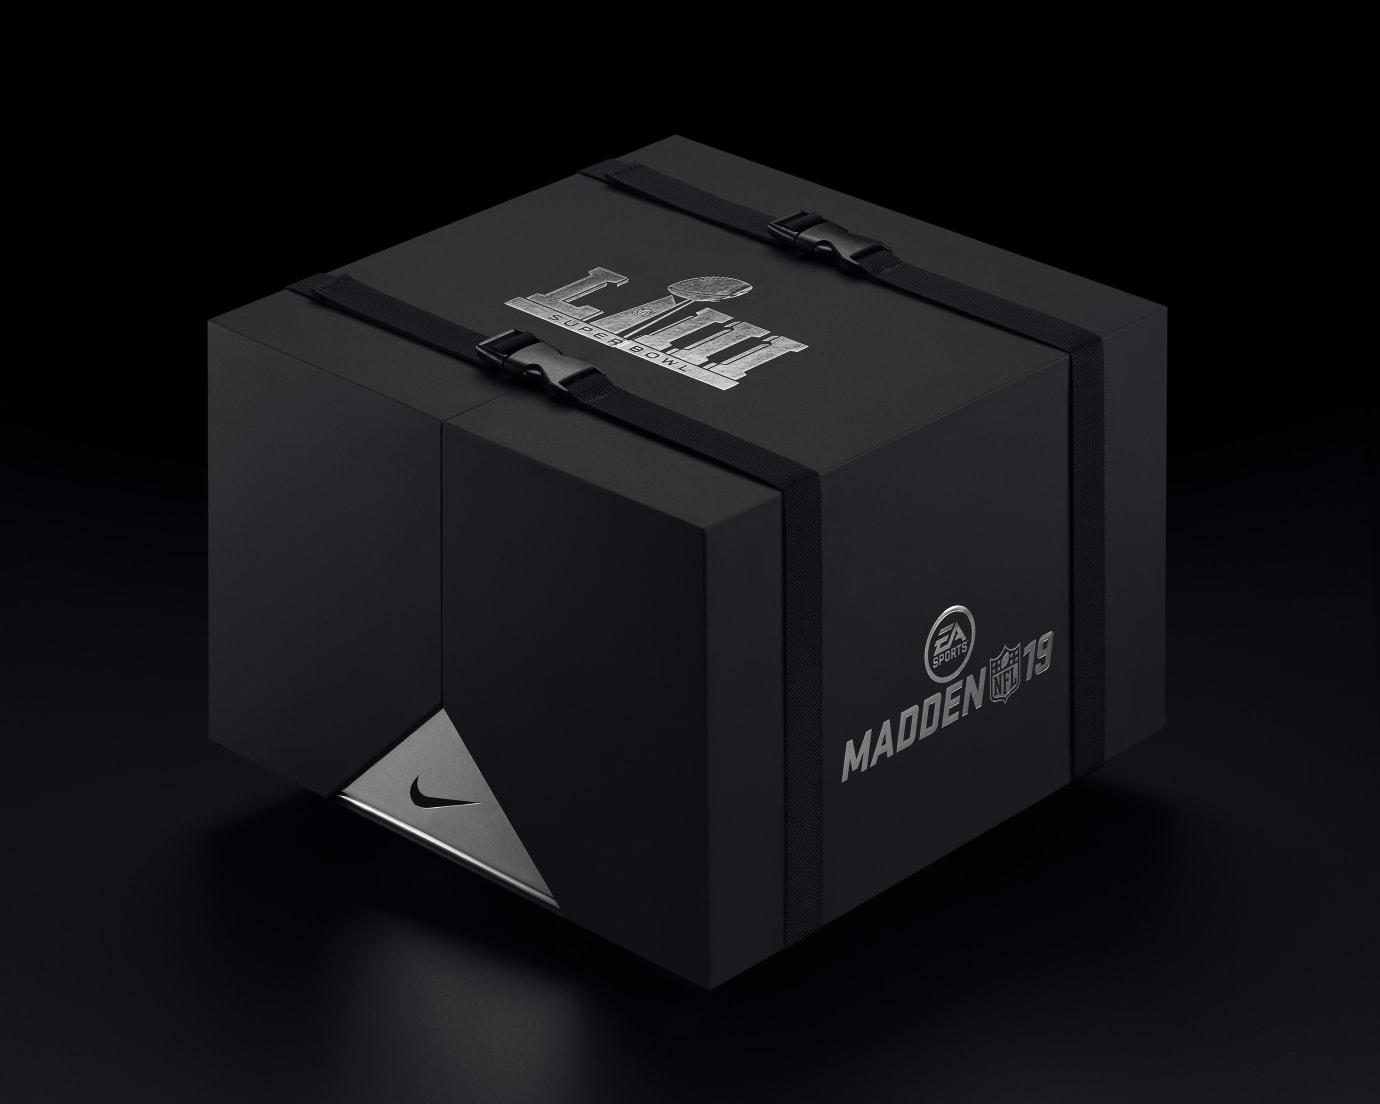 EA Sports x Nike VaporMax 19 'Madden Pack' 2